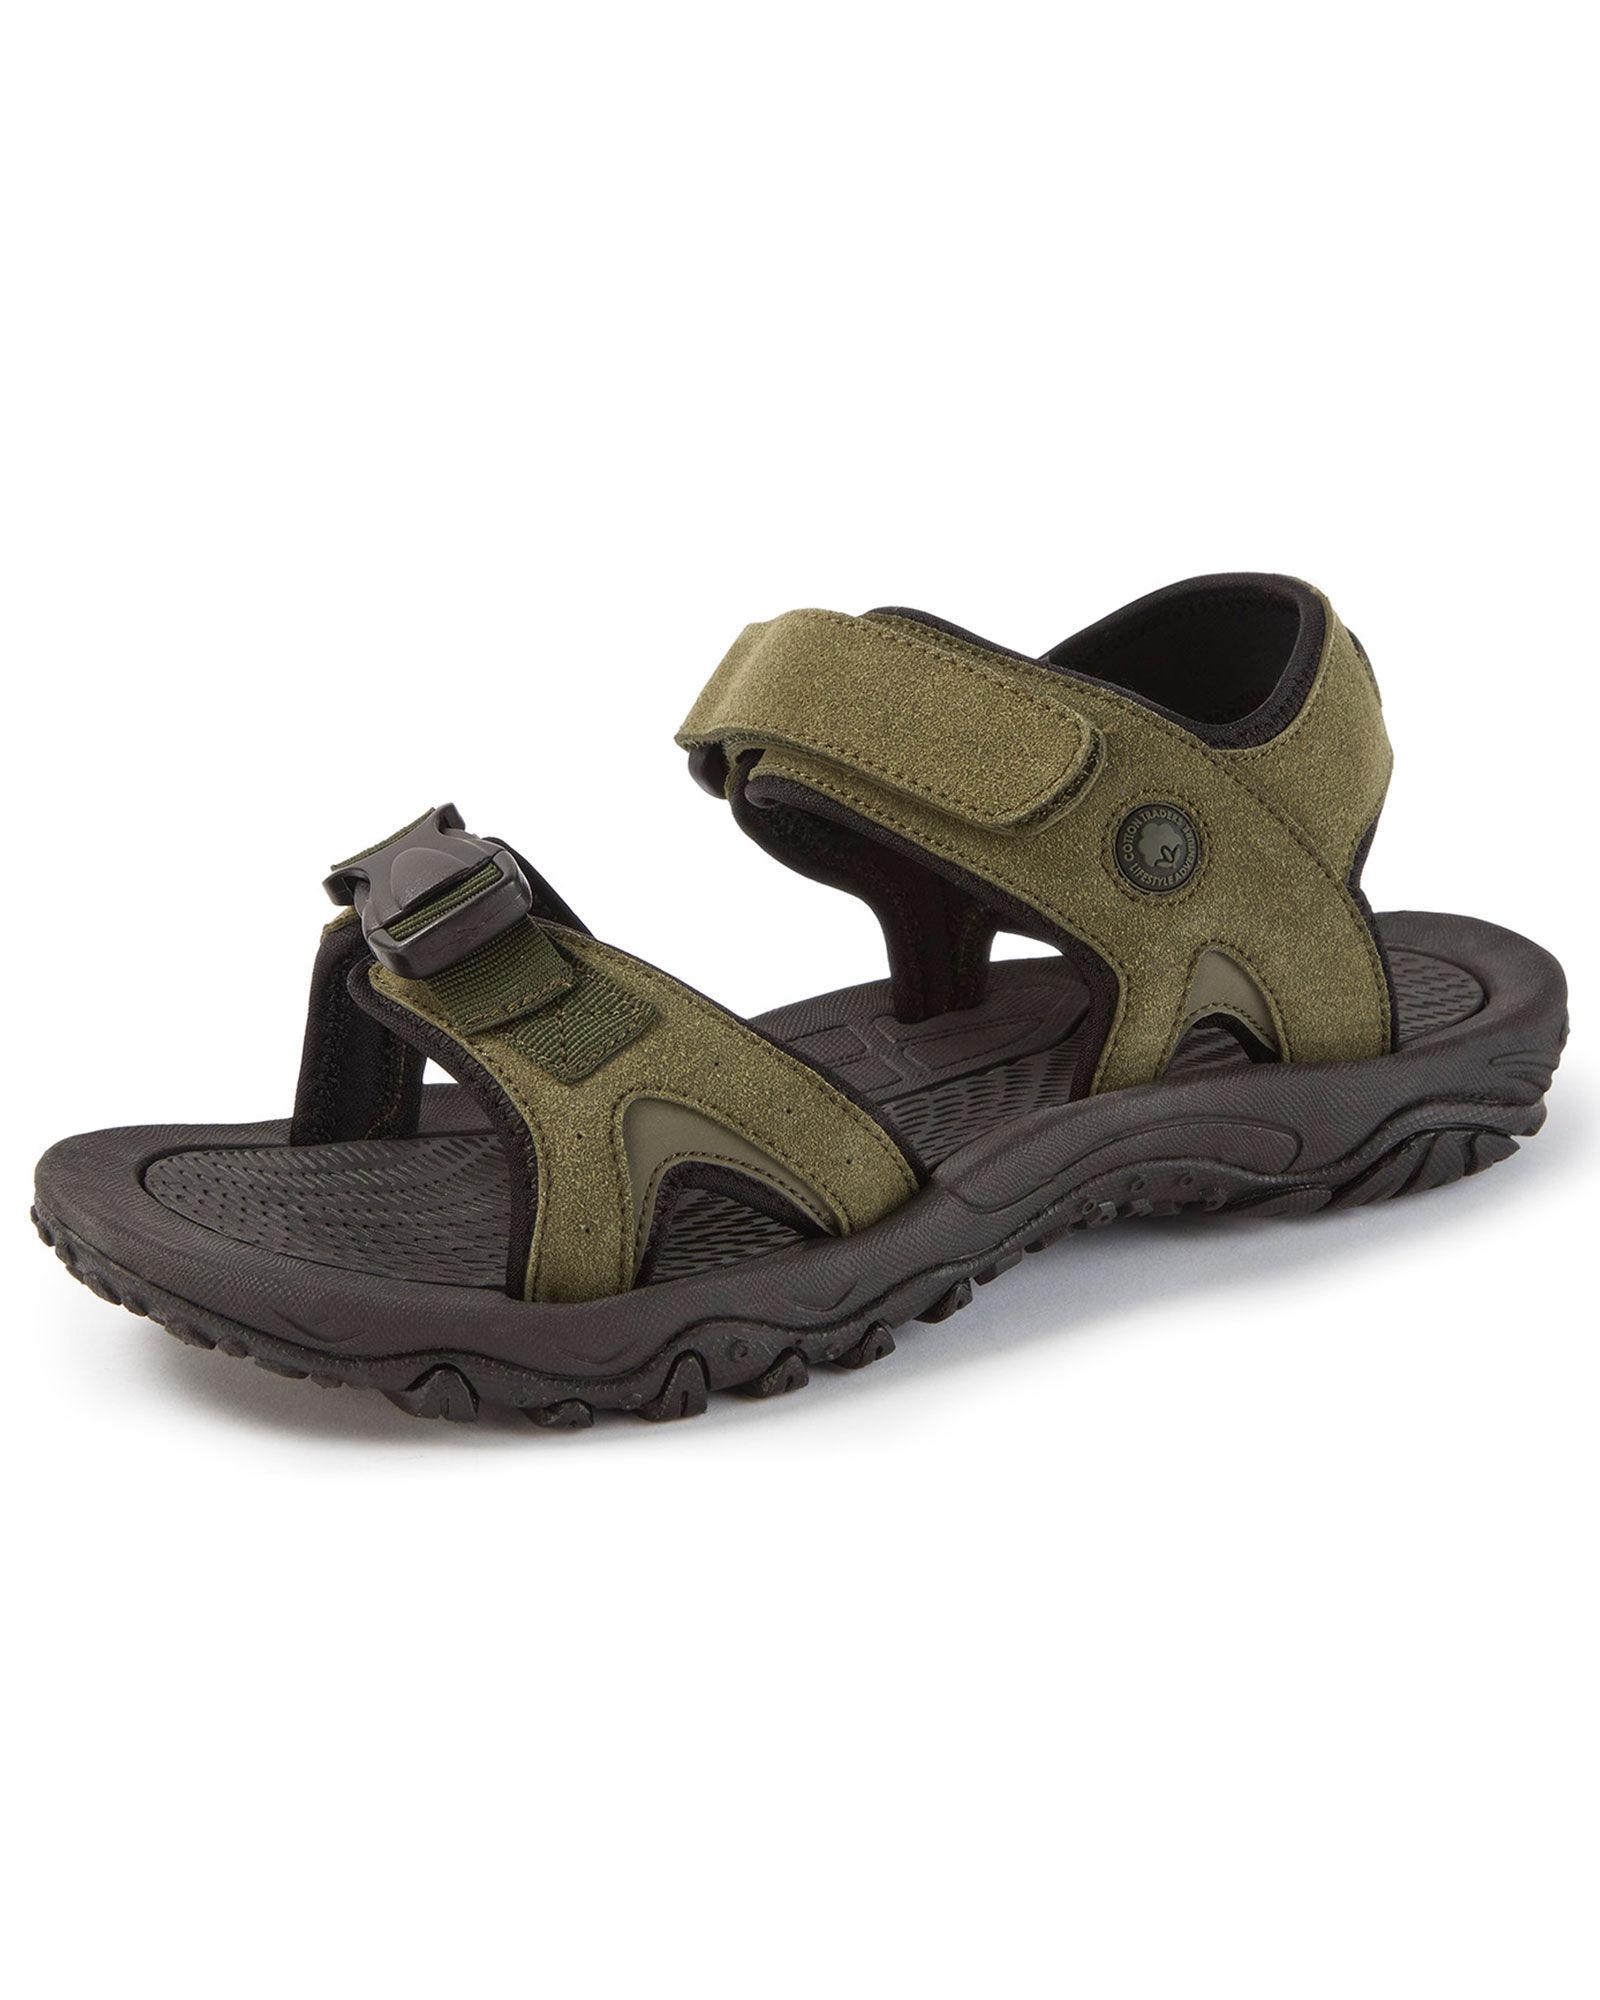 Lightweight Walking Sandals at Cotton